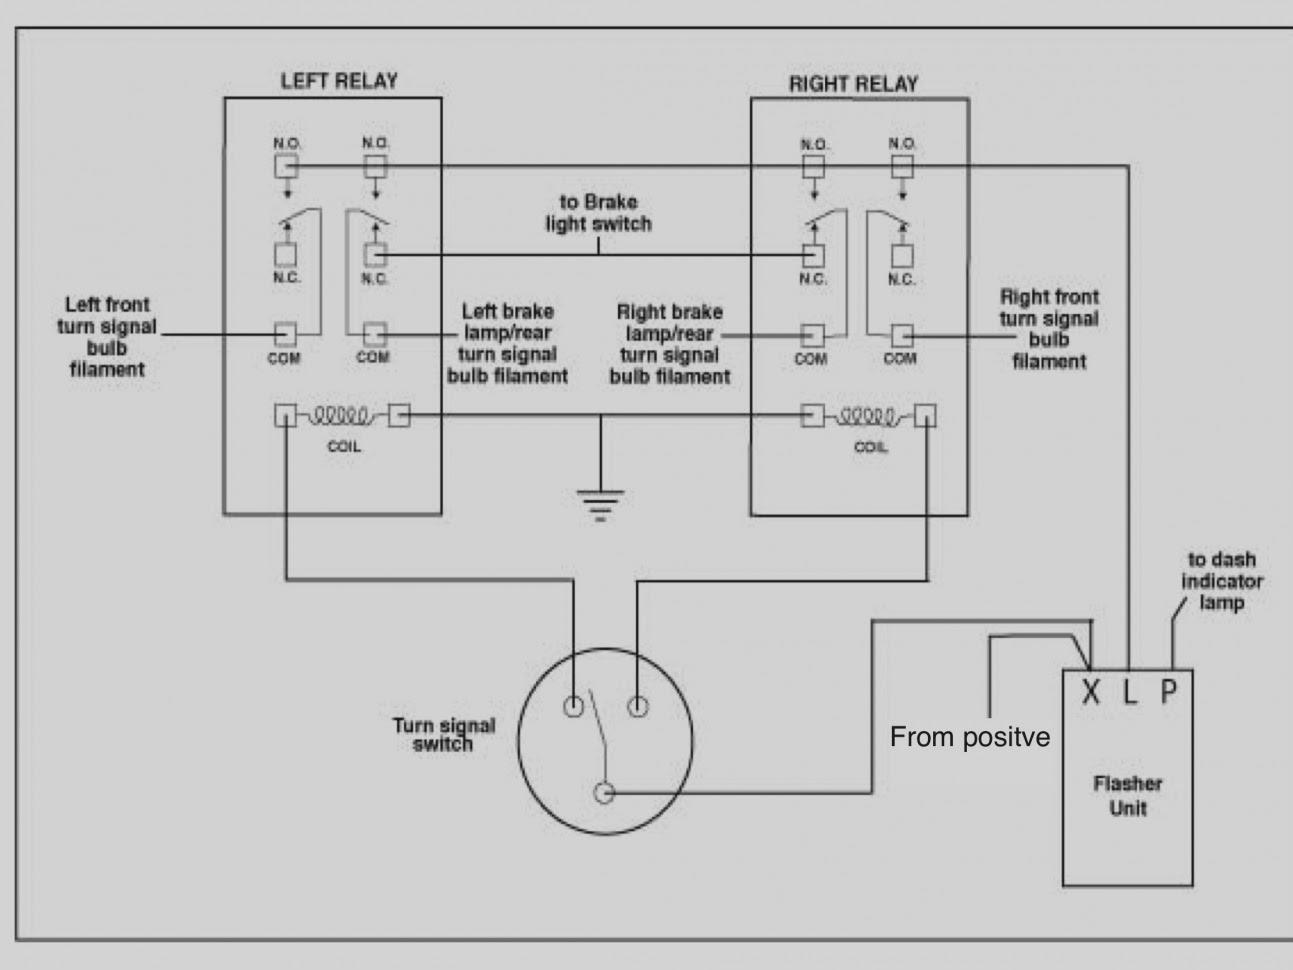 Diagram Illustrates The 2010 Polaris Atv Sportsman 800 Wiring Diagram Full Version Hd Quality Wiring Diagram Diagrambeatai Emporiodue It